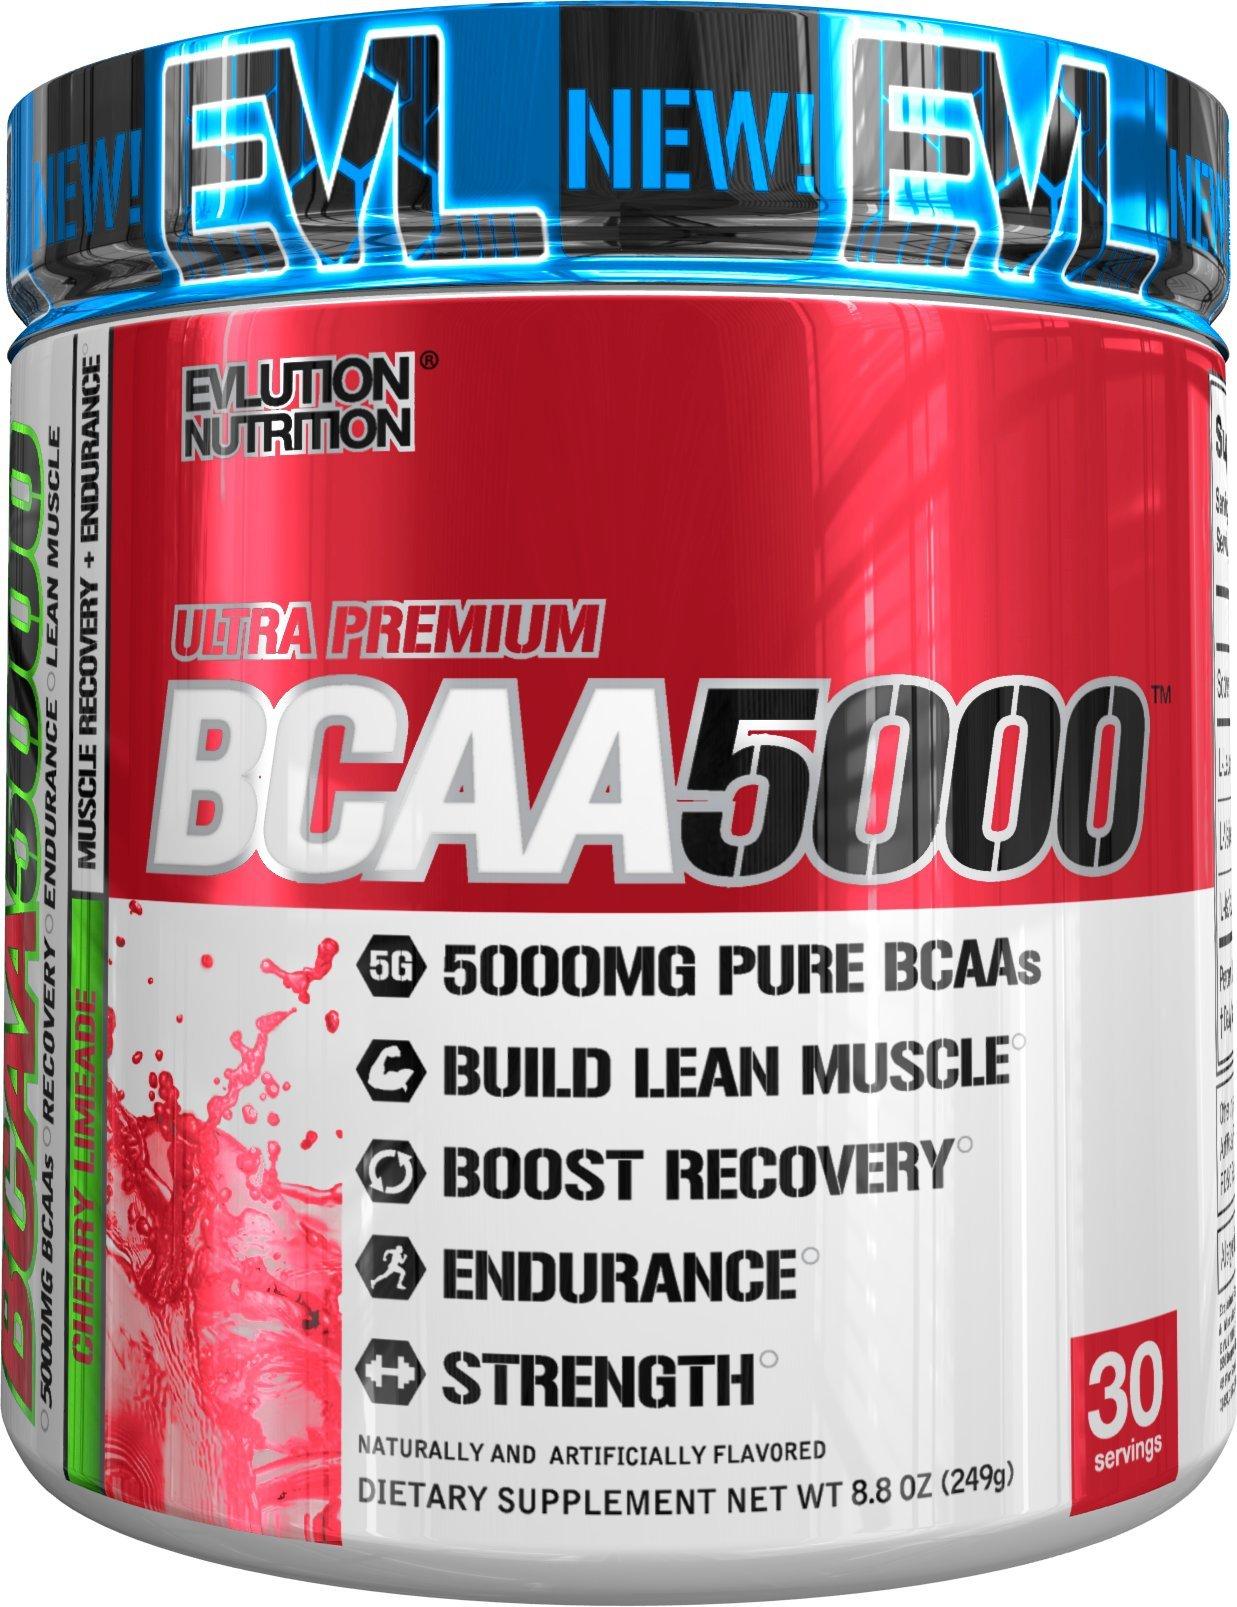 Evlution Nutrition BCAA5000 Powder 5 Grams of Premium BCAAs (Cherry Limeade, 30 servings)